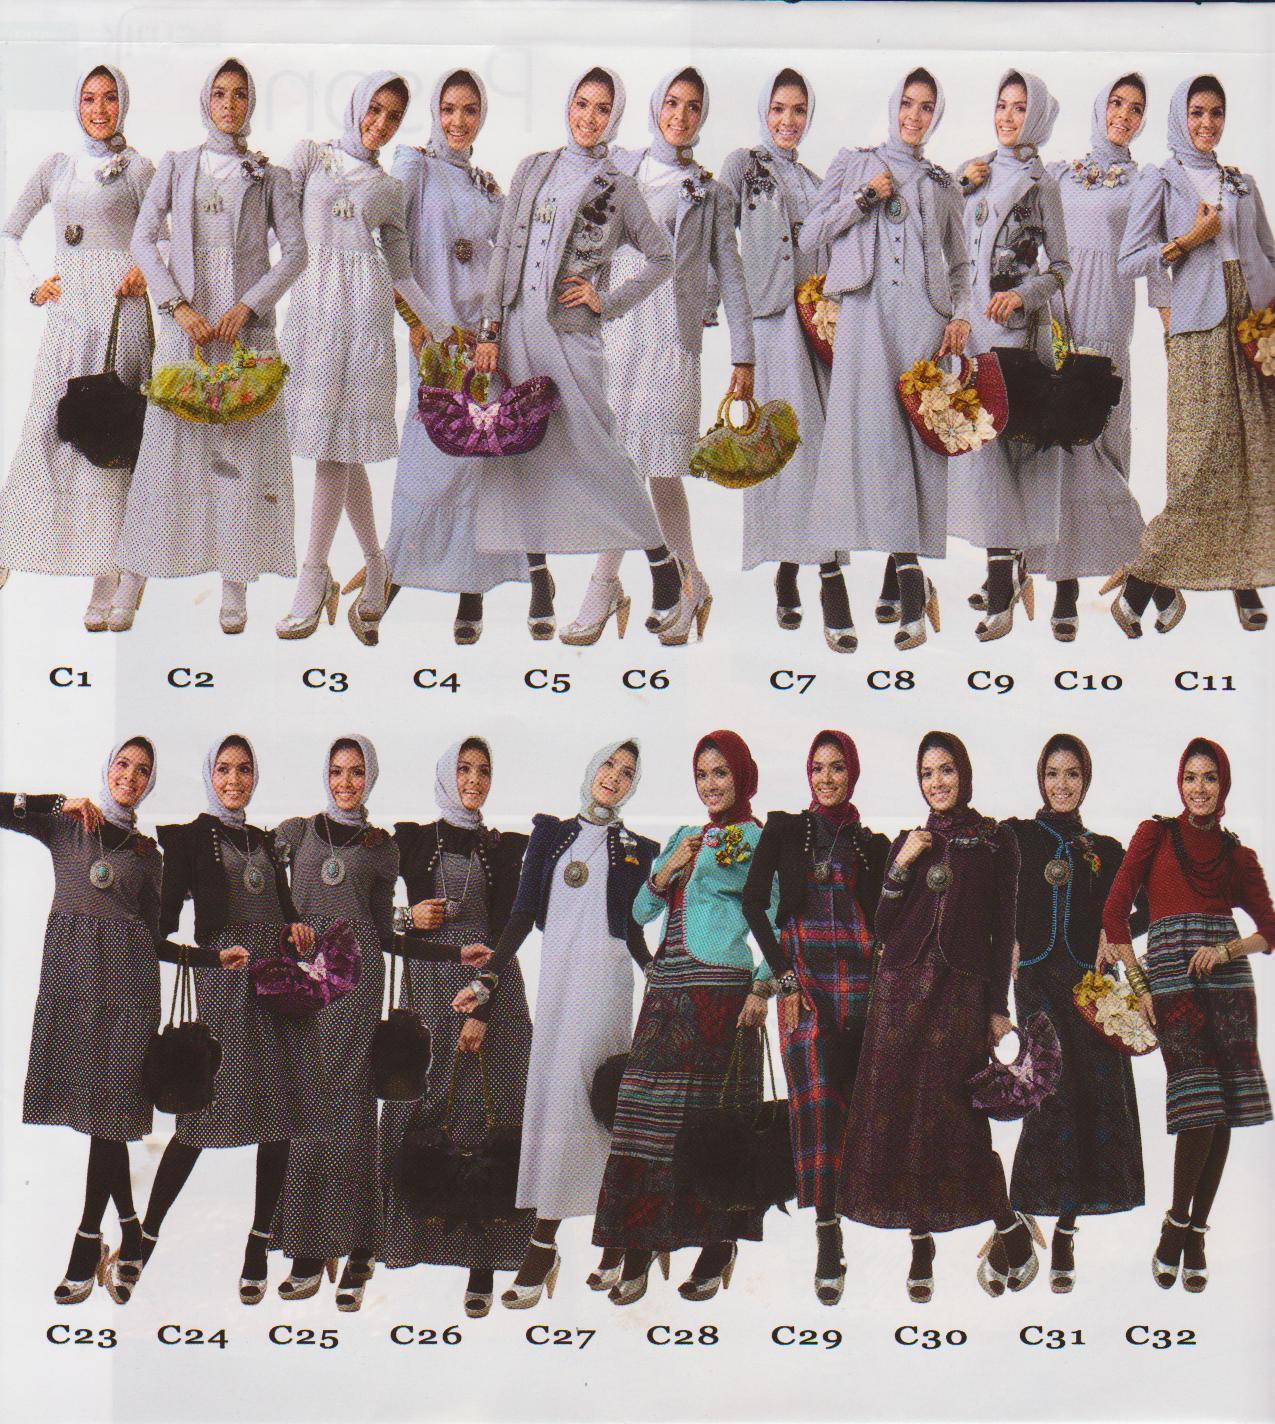 Grosir Busana Muslim Baju Pakaian Muslimah Anak Remaja Dewasa 2015 ...